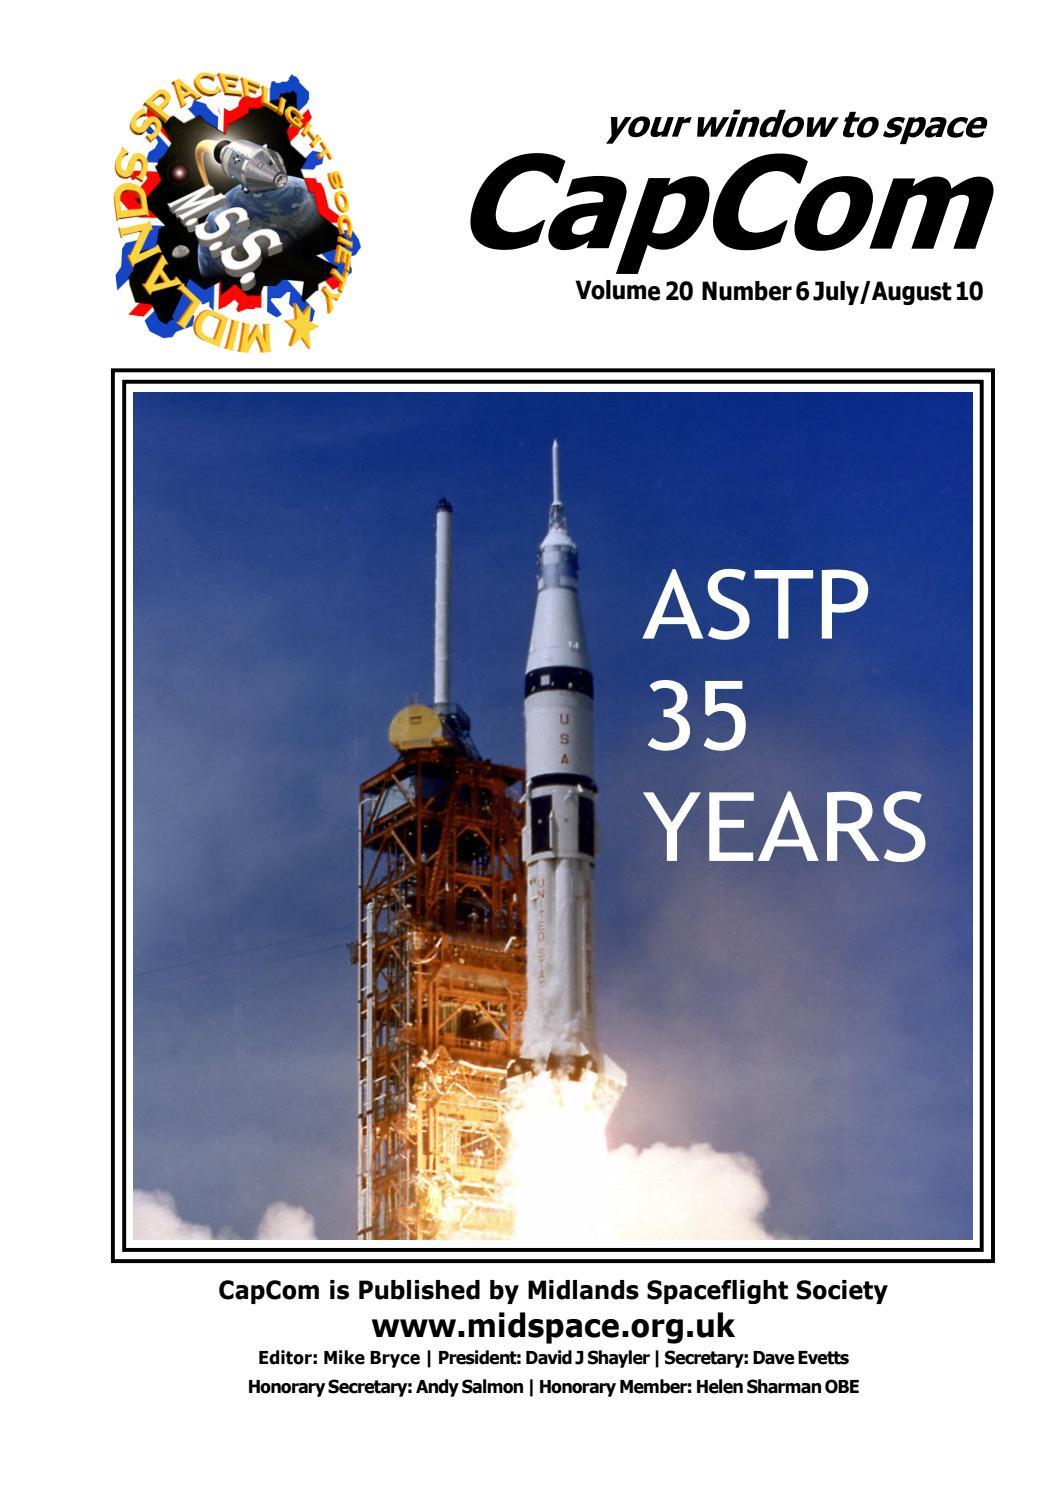 Capcom 206 by Midlands Spaceflight Society - issuu